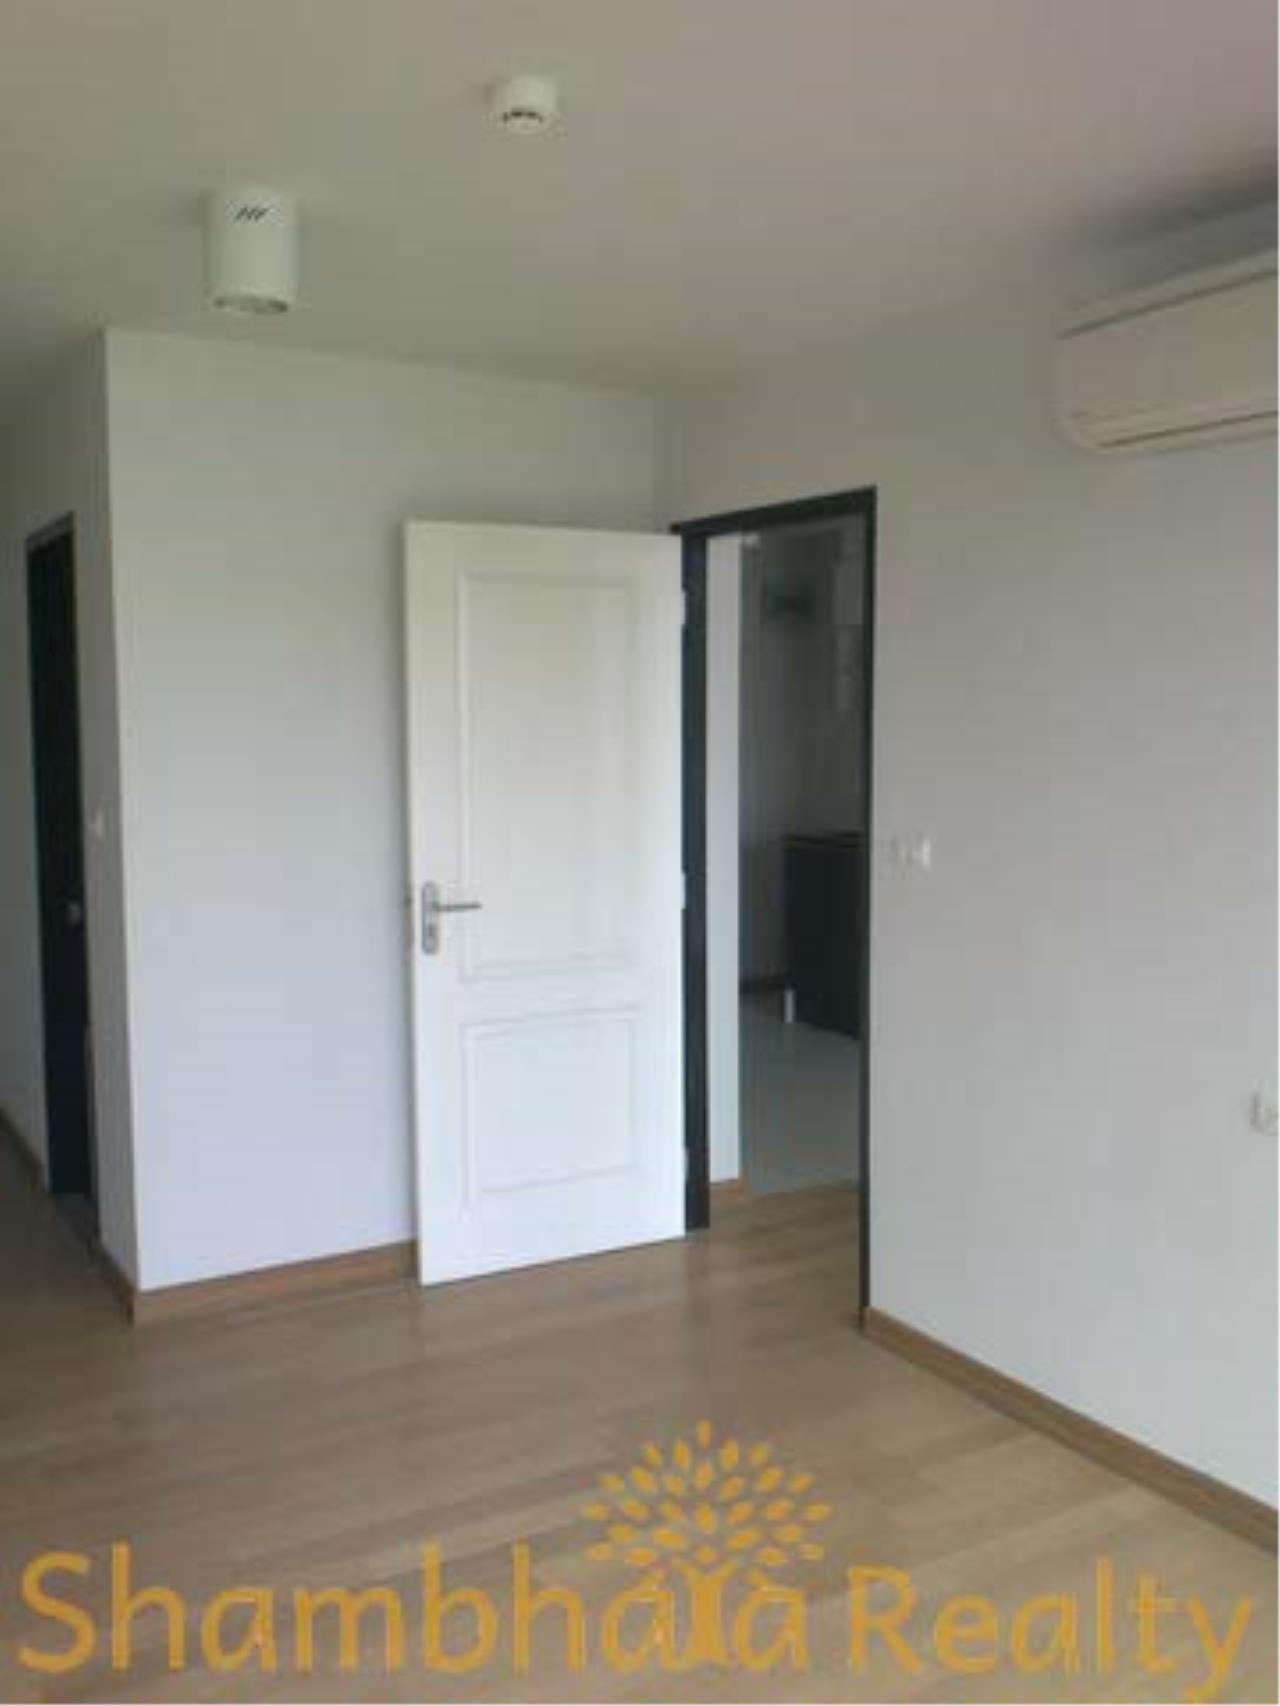 Shambhala Realty Agency's Bangkok Feliz @ Sukhumvit 69 Condominium for Sale in Sukhumvit 69 5